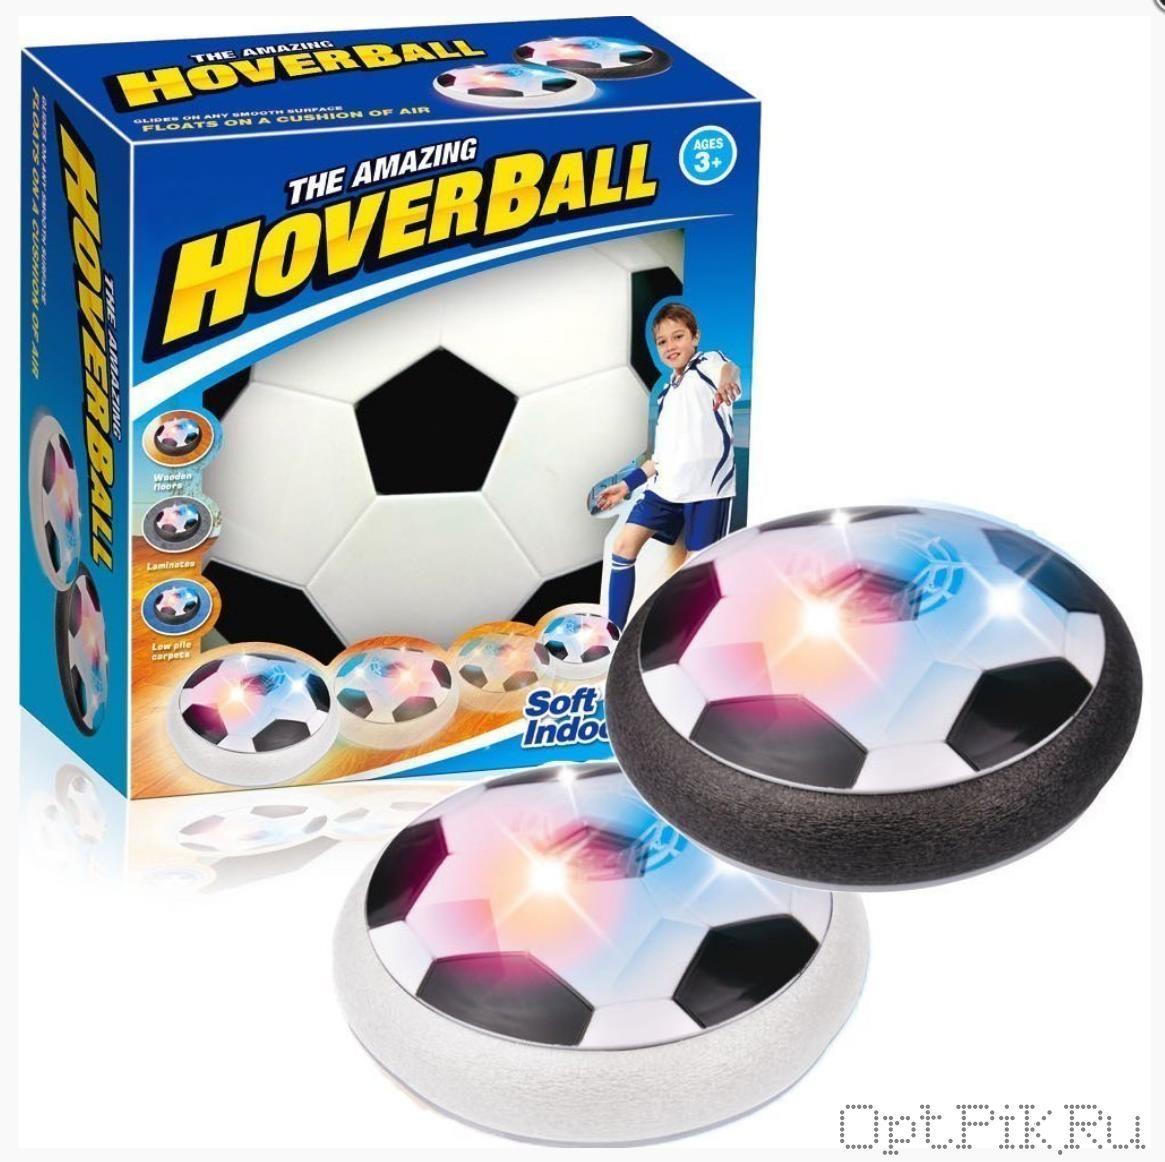 Аэромяч с подсветкой для дома HoverBall